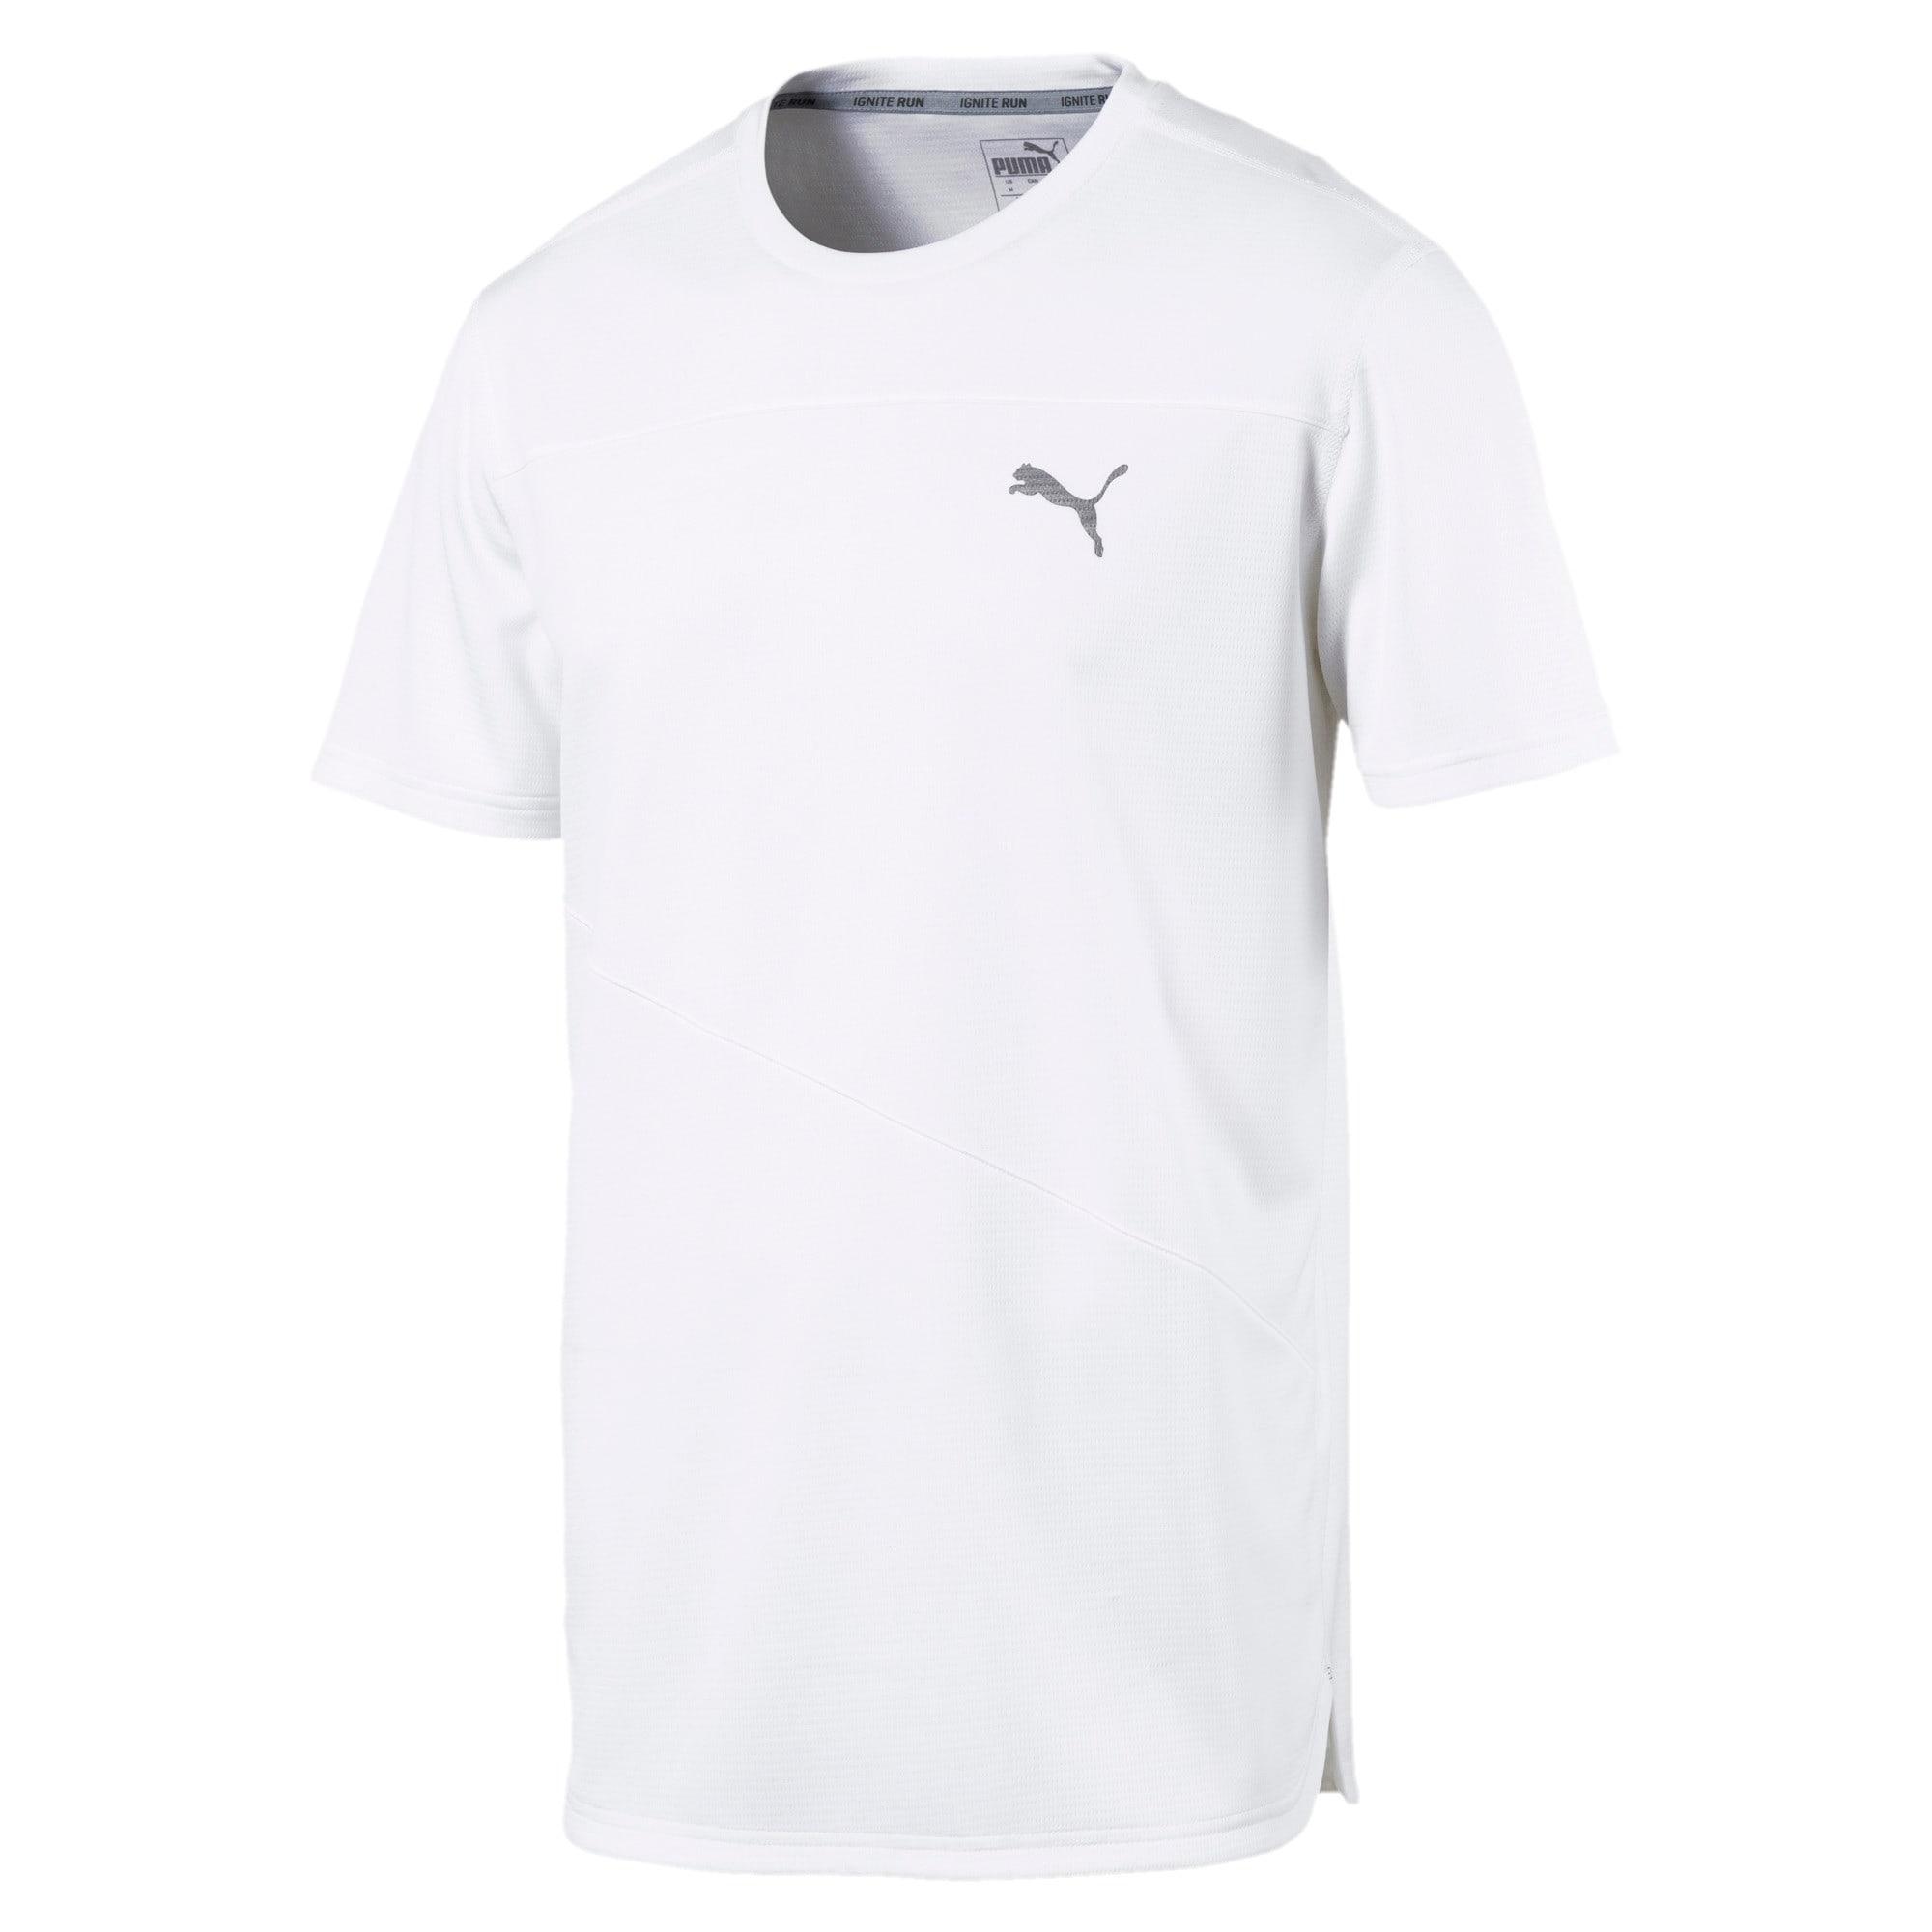 Thumbnail 4 of Running Men's IGNITE Mono T-Shirt, Puma White, medium-IND